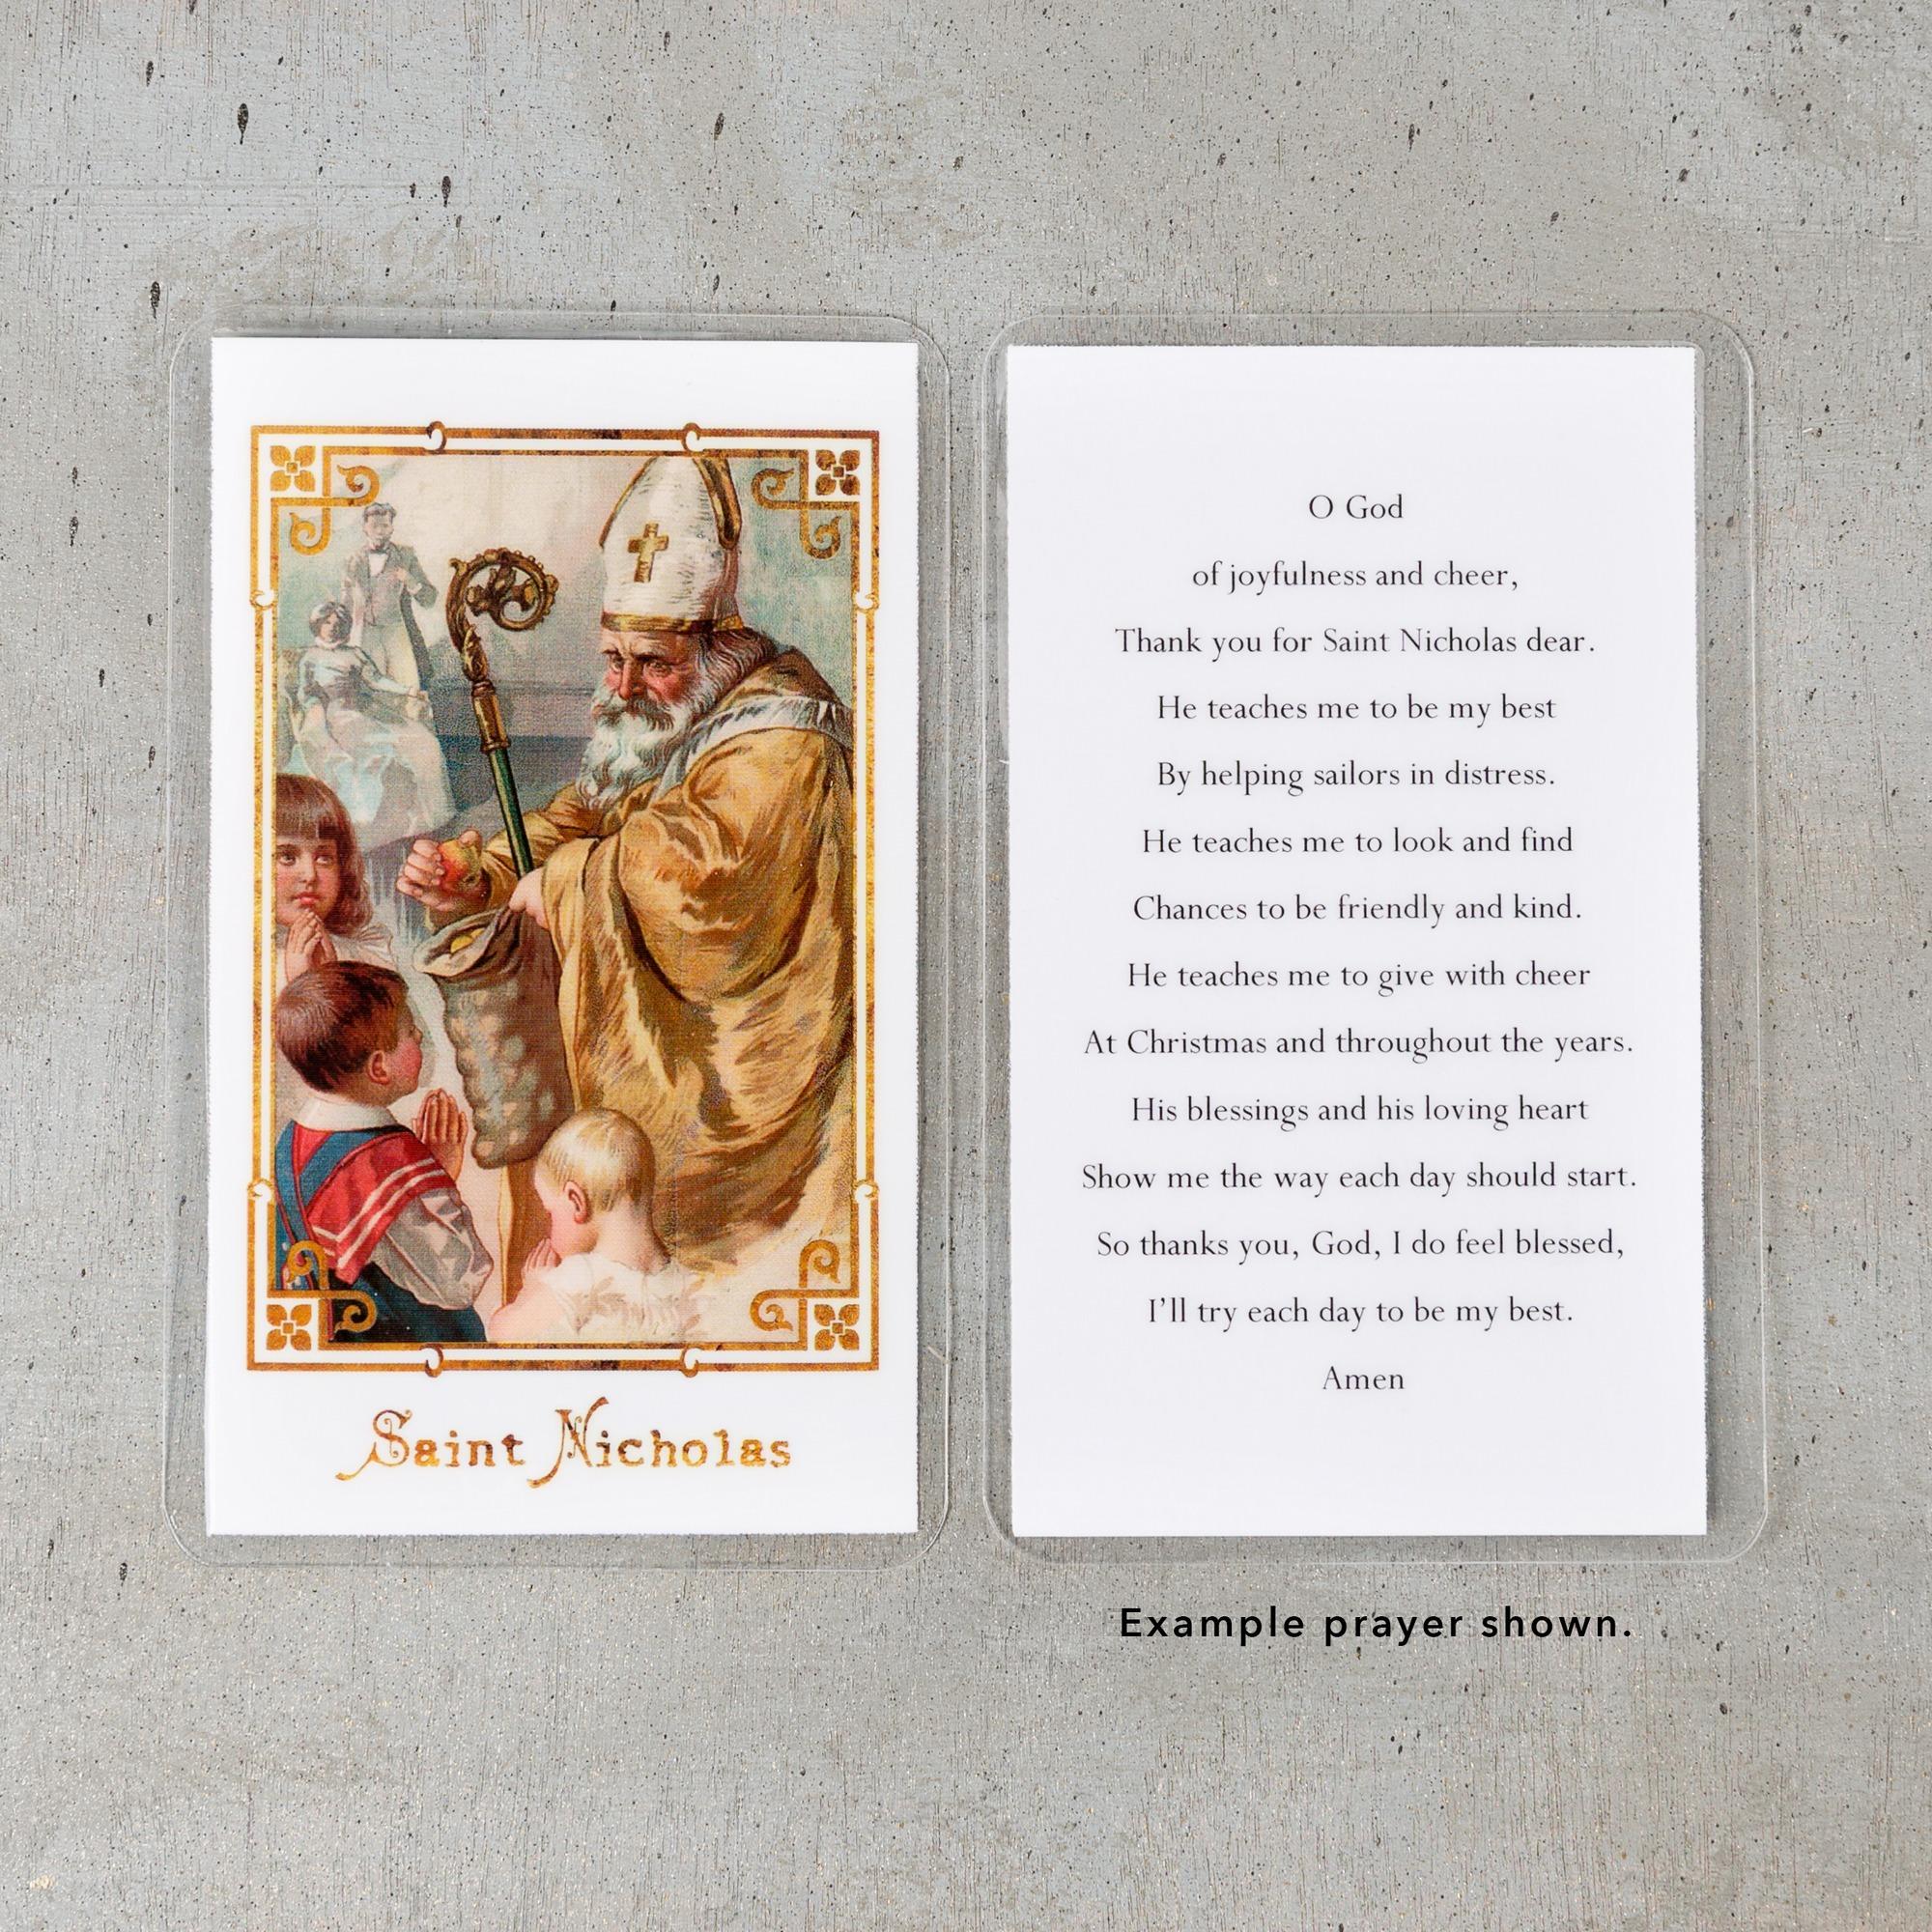 Vintage St Nicholas Personalized Prayer Cards | The Catholic Company